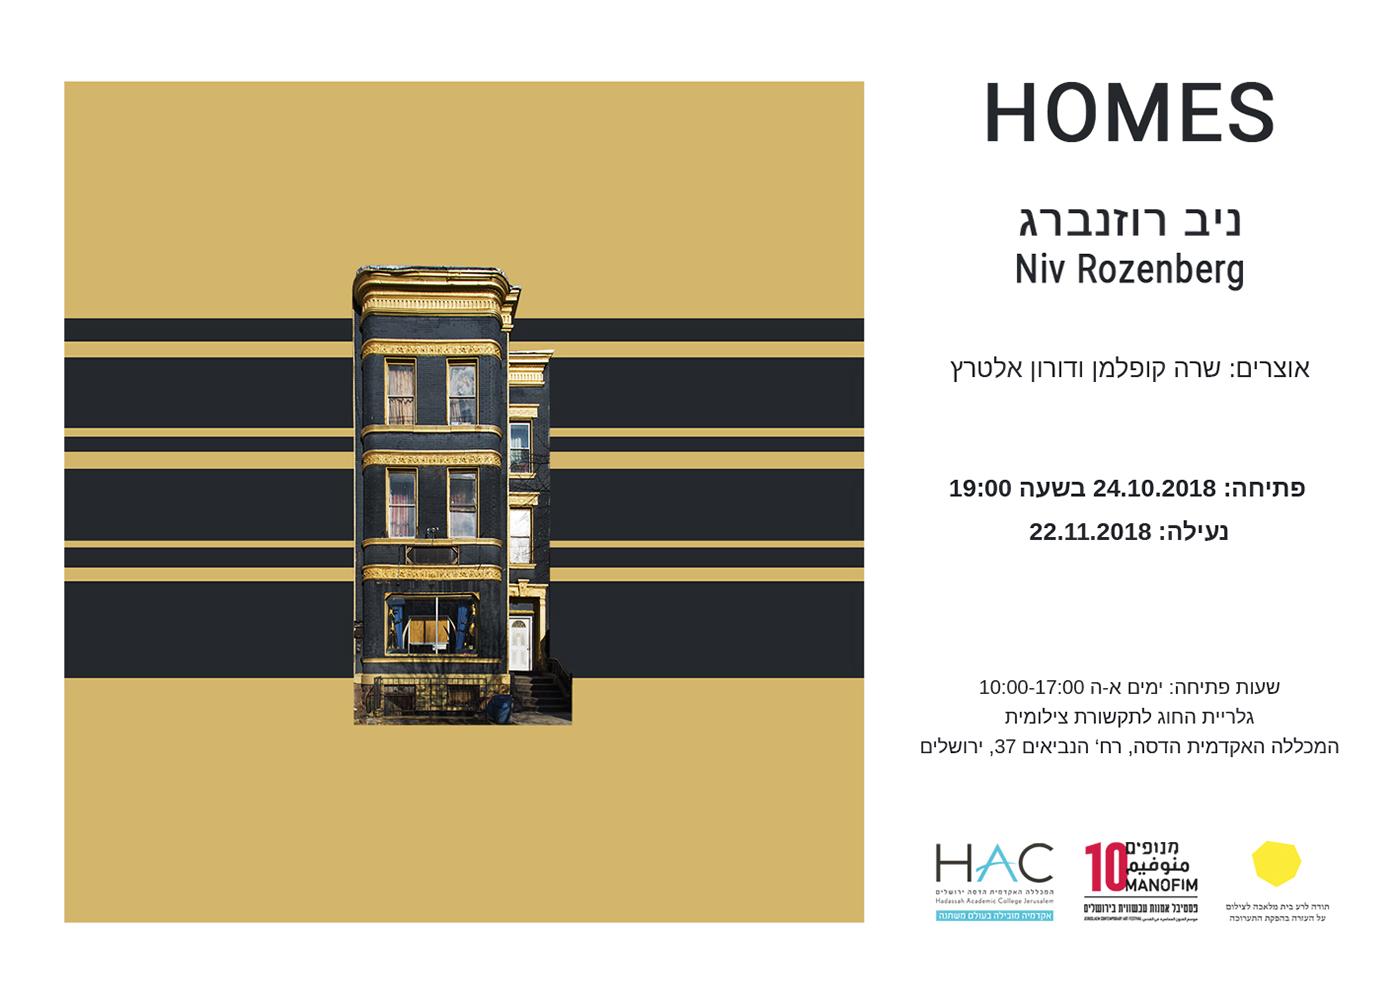 Homes: Solo Exhibitionat Hadassah College - Department of Photographic Communications Curator: Sara Kopelman and Doron AltaratzOctober 24, 2018 - November 22, 2018Opening reception: October 24, 2018 at 7pm.